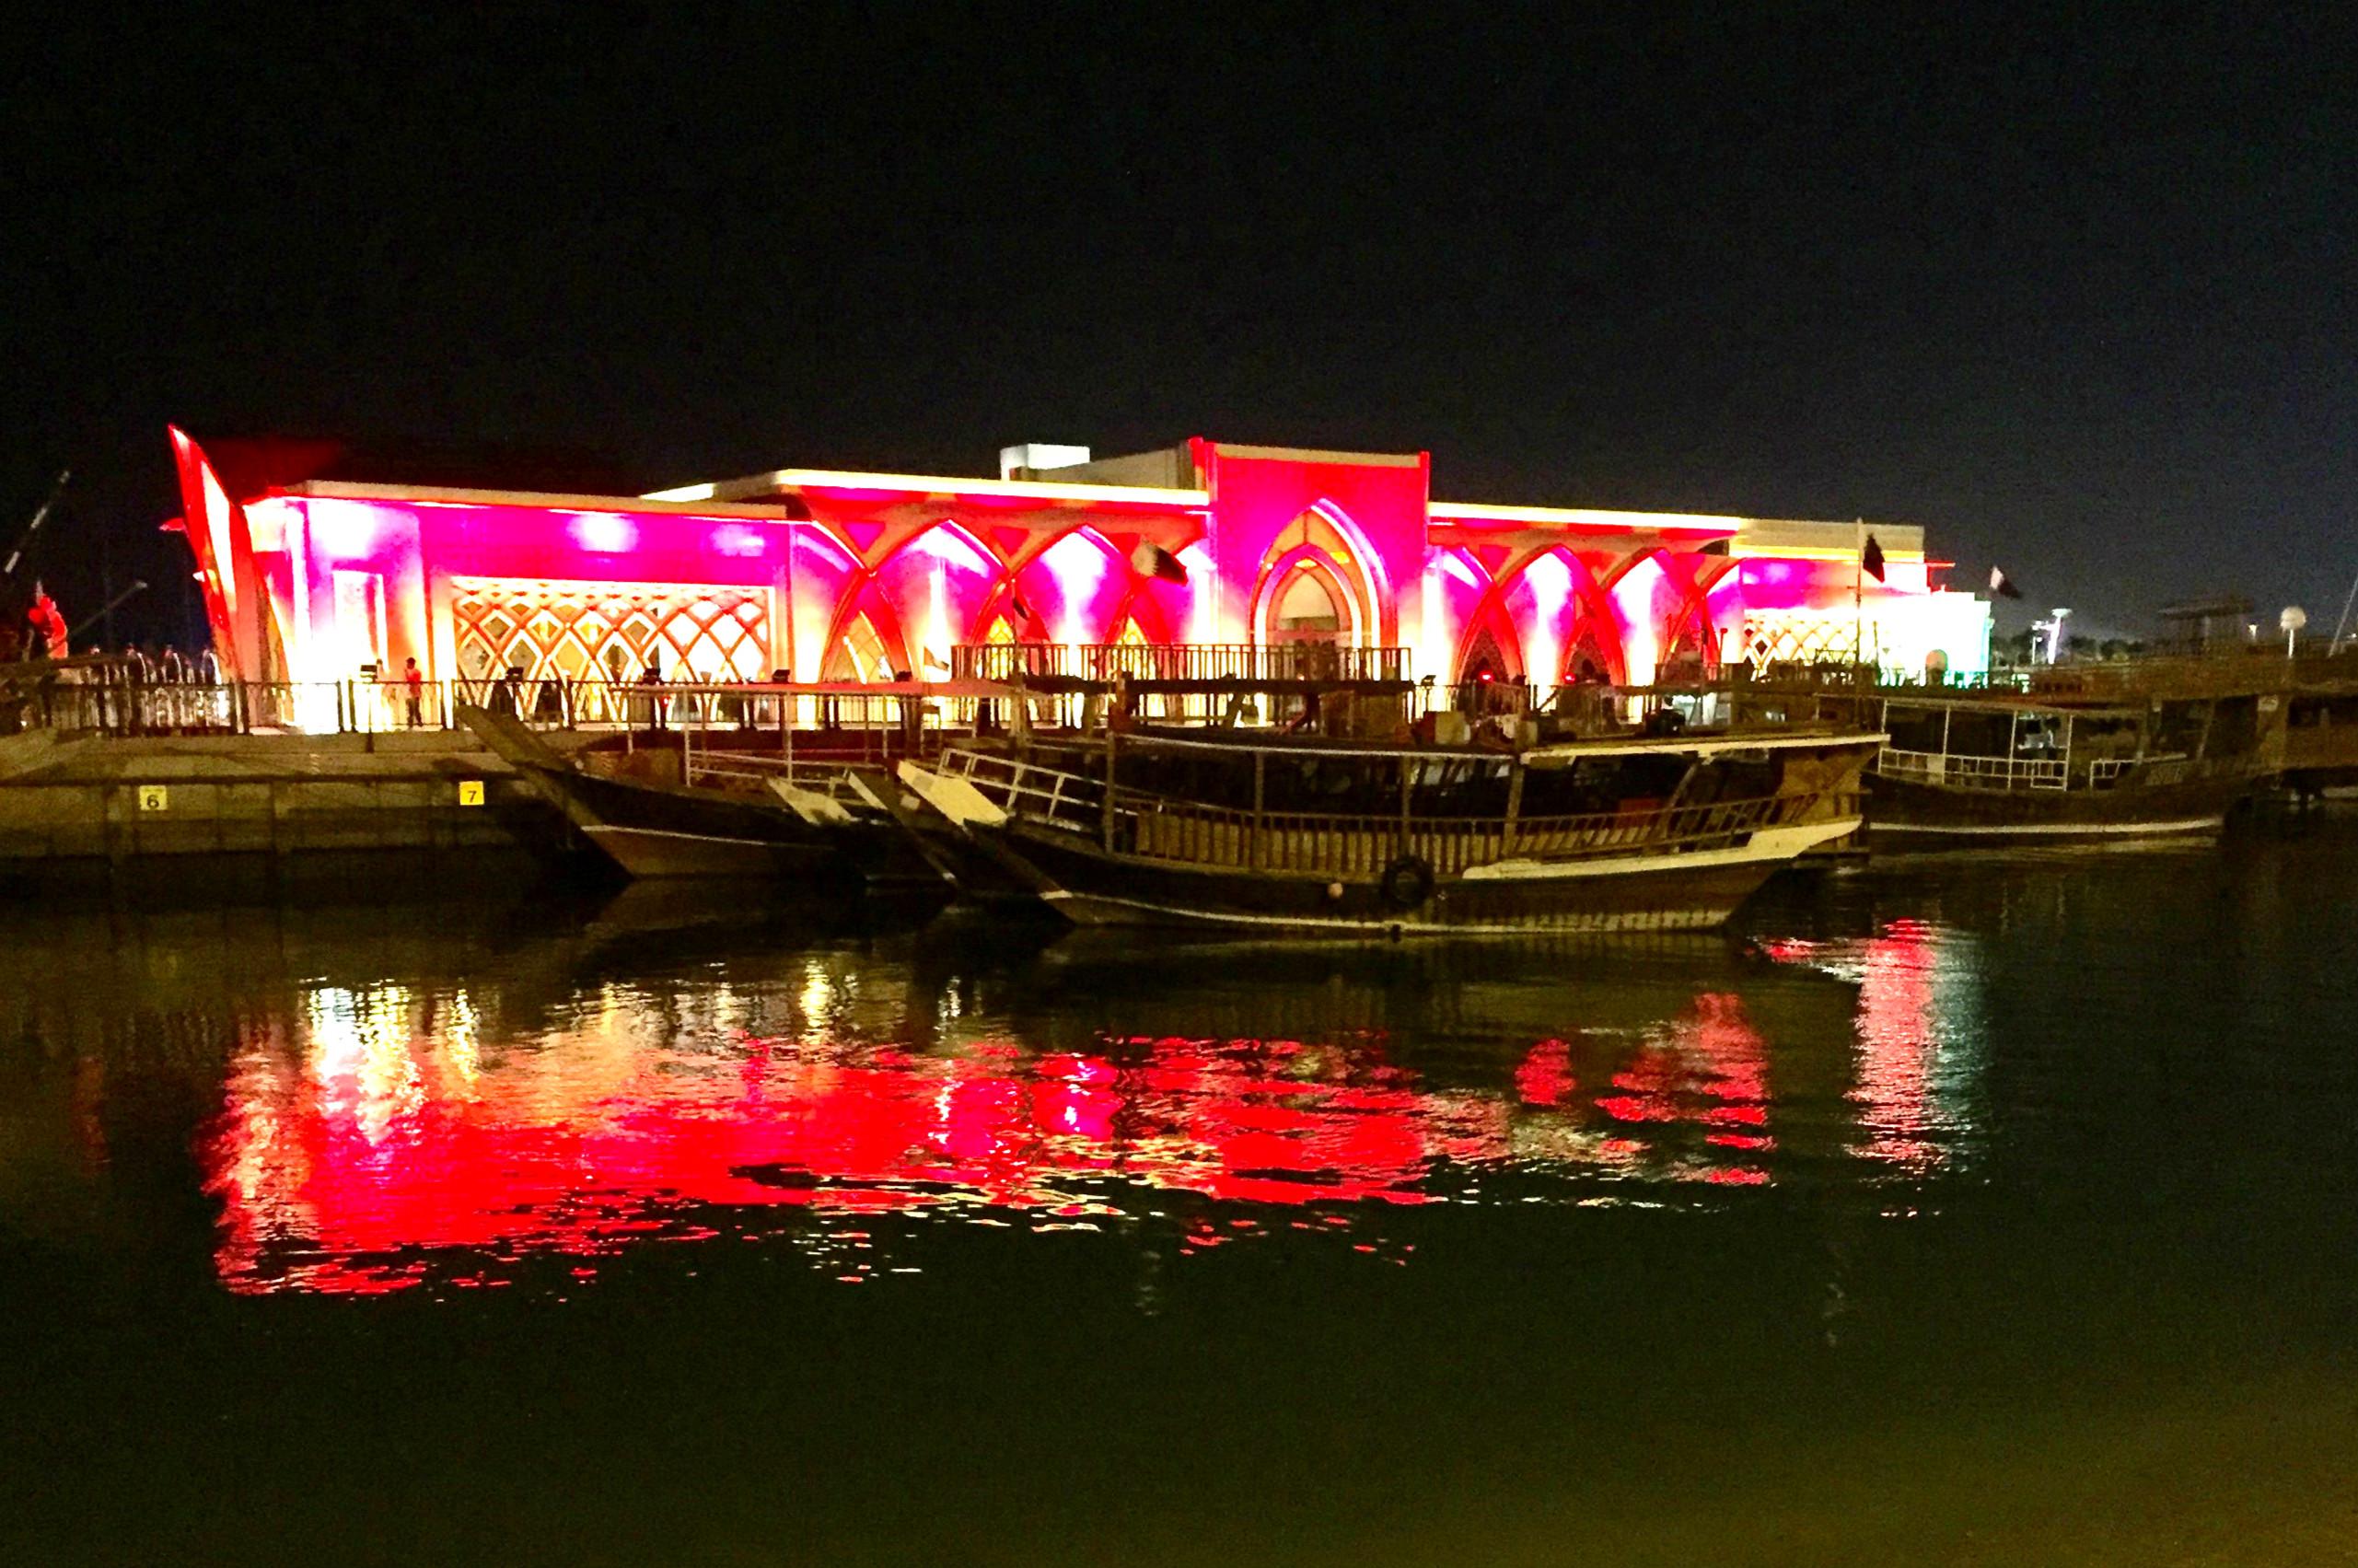 Restaurant ved havnepromenaden Corniche.